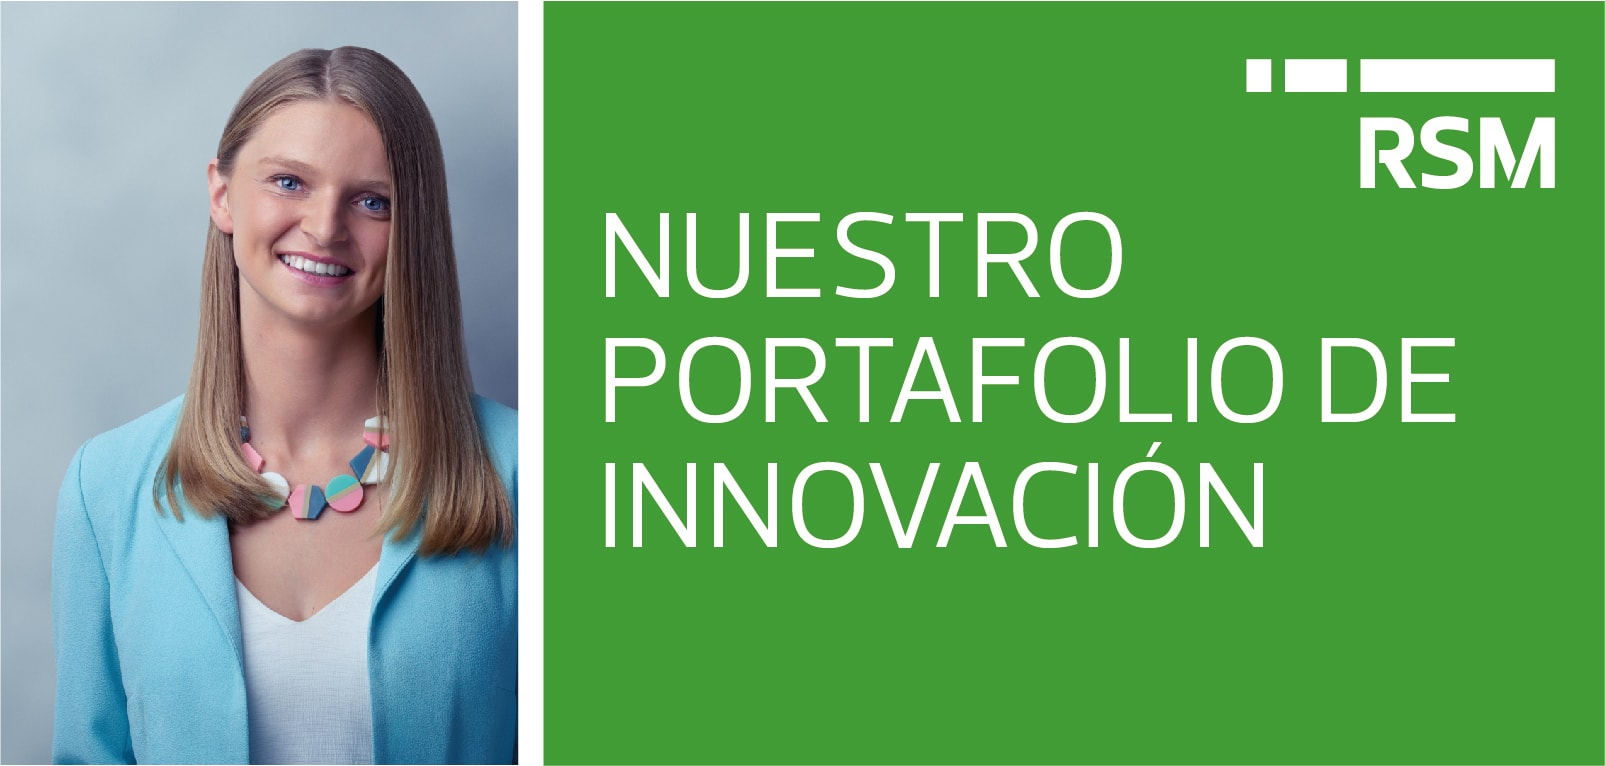 public://media/Lineas_negocio/consultoria/Innovacion/miniaturas-03.jpg